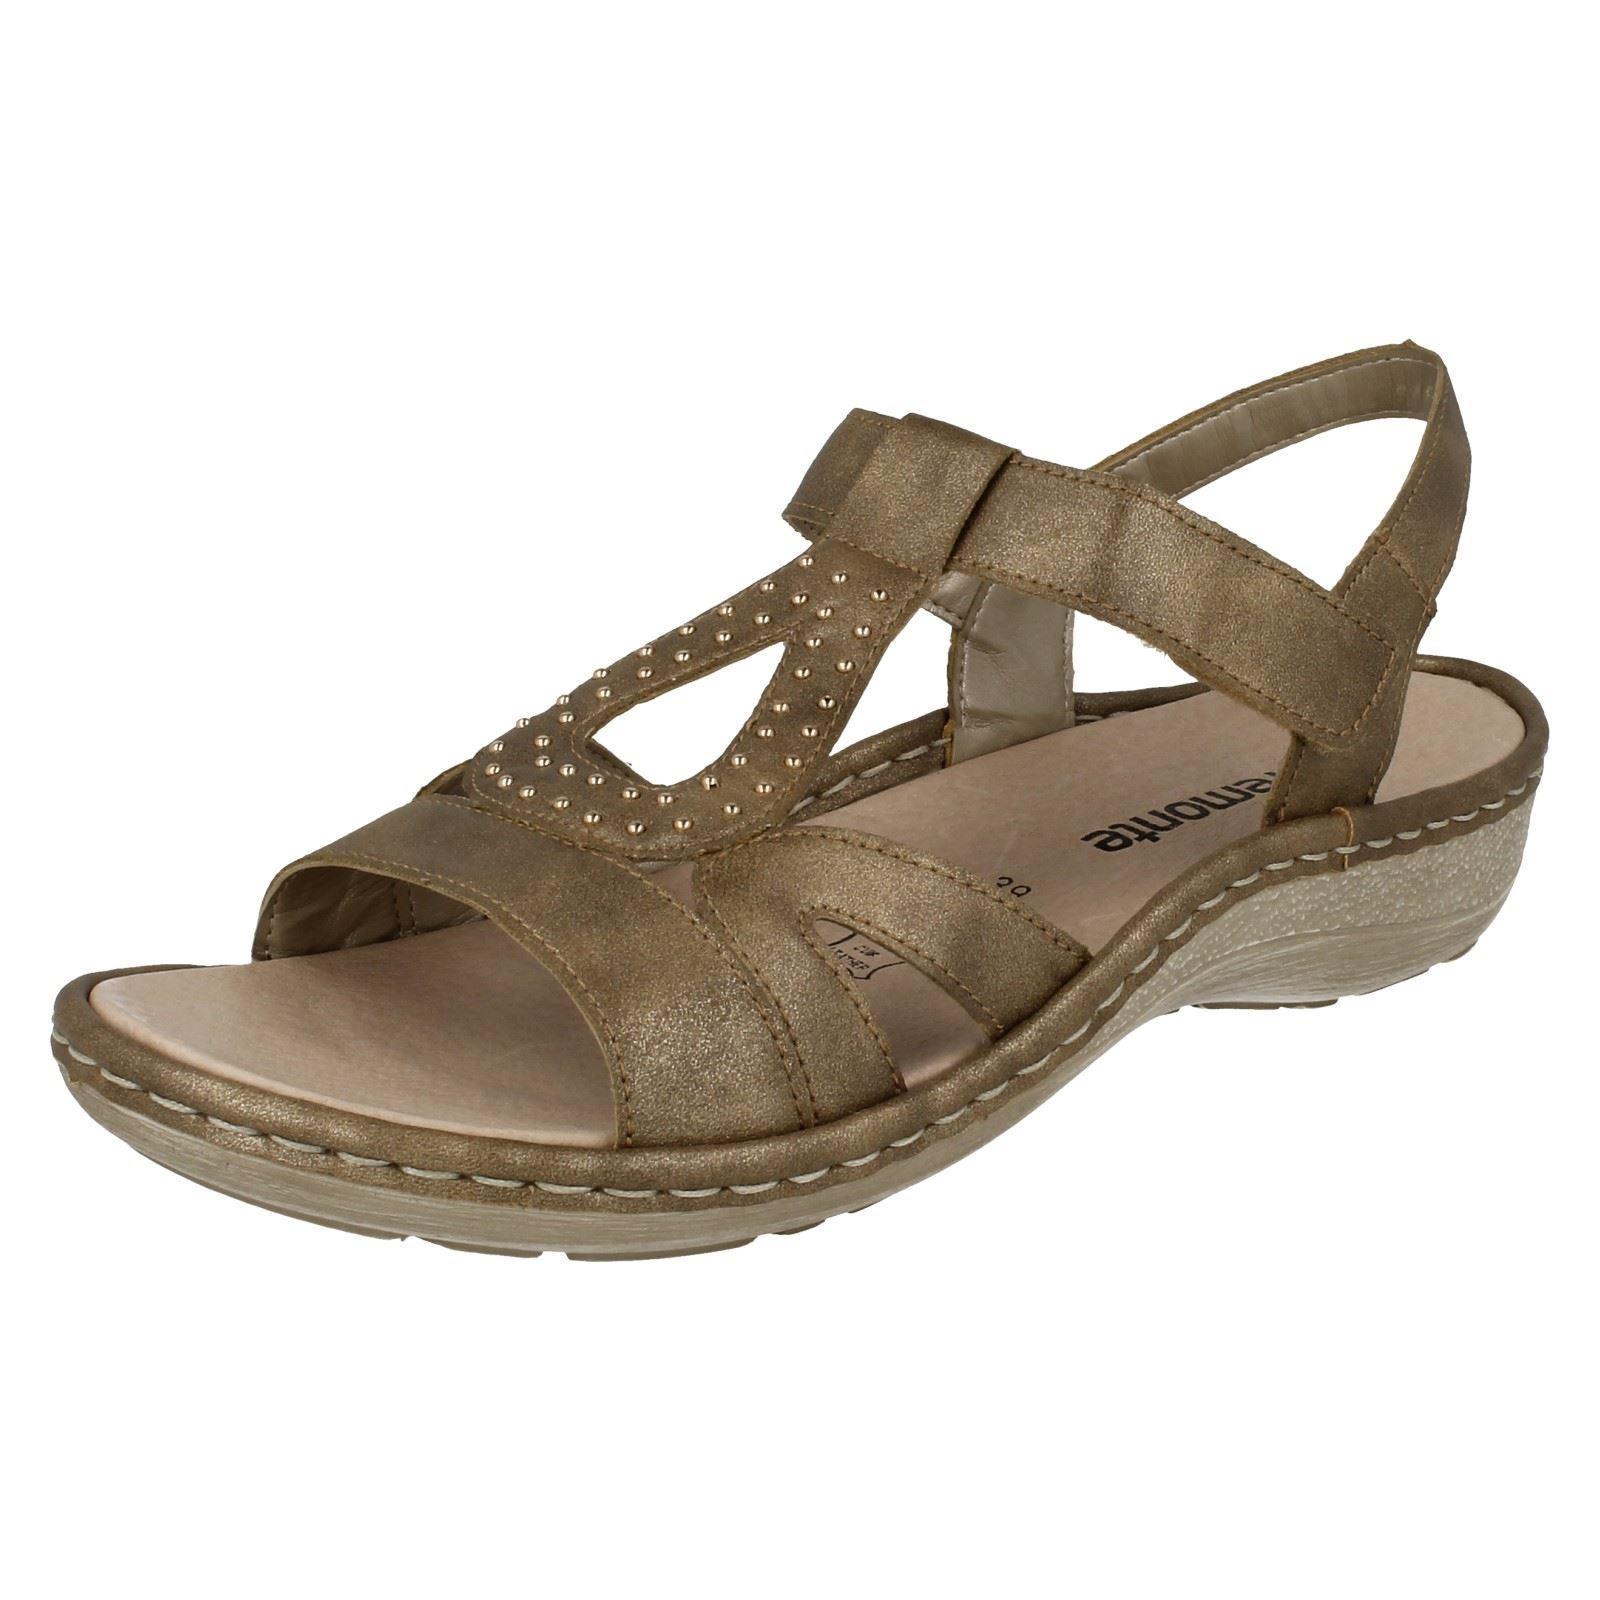 Remonte Dorndorf D7657 D7657 D7657 Ladies gold Slingback Sandals 030fd6